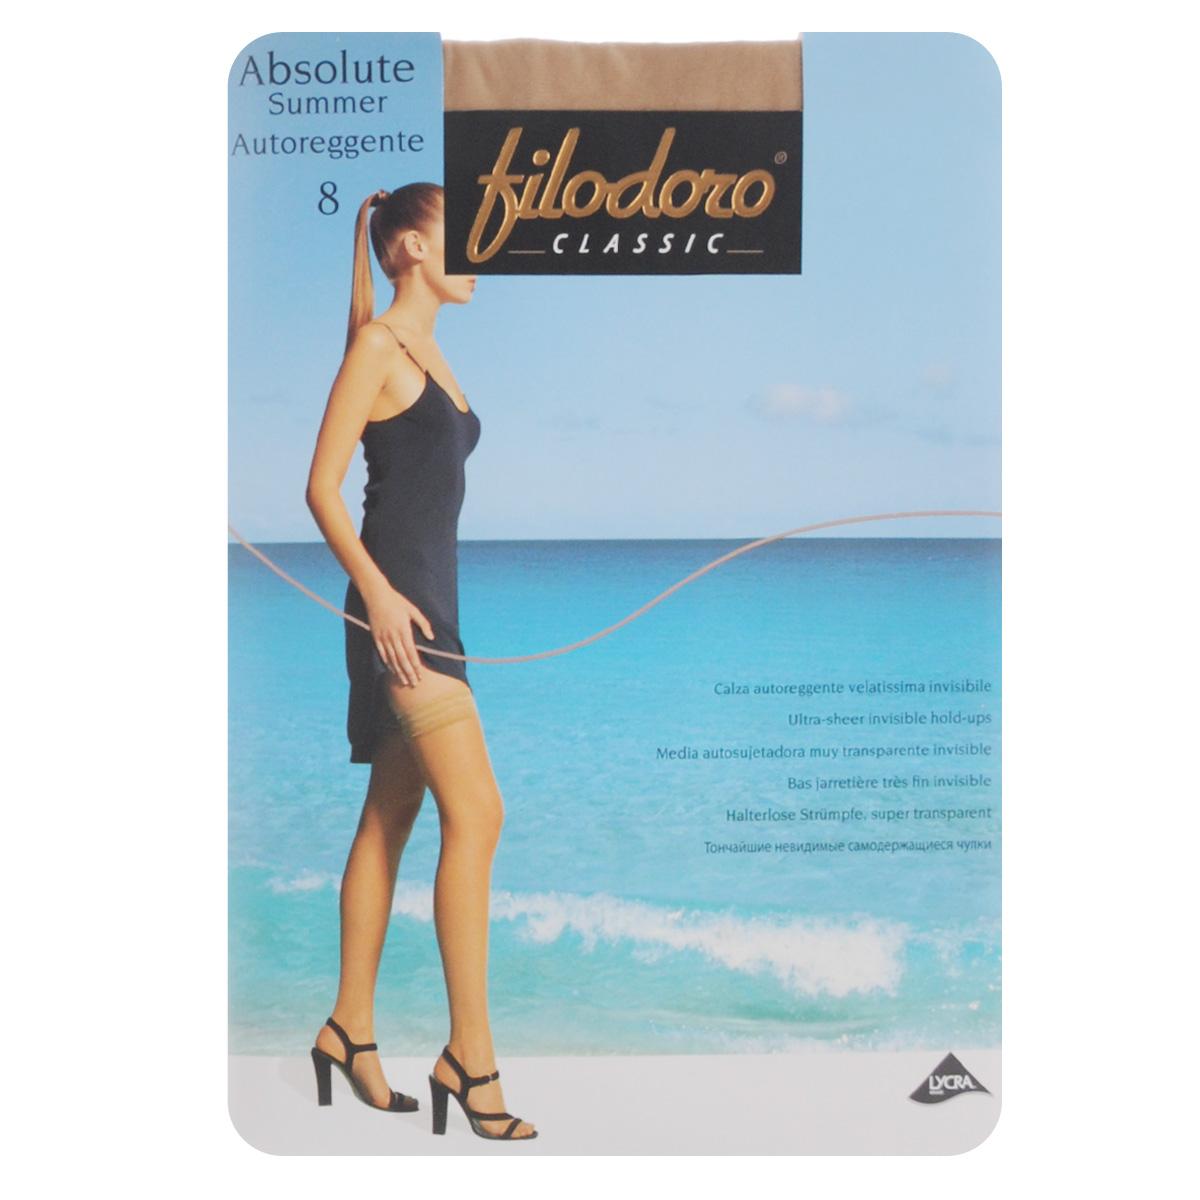 Чулки Filodoro Classic Absolute Summer 8 Autoreggente, цвет: Playa (телесный). C109801FC. Размер 3 (M) чулки omsa malizia размер 4 плотность 20 den caramello